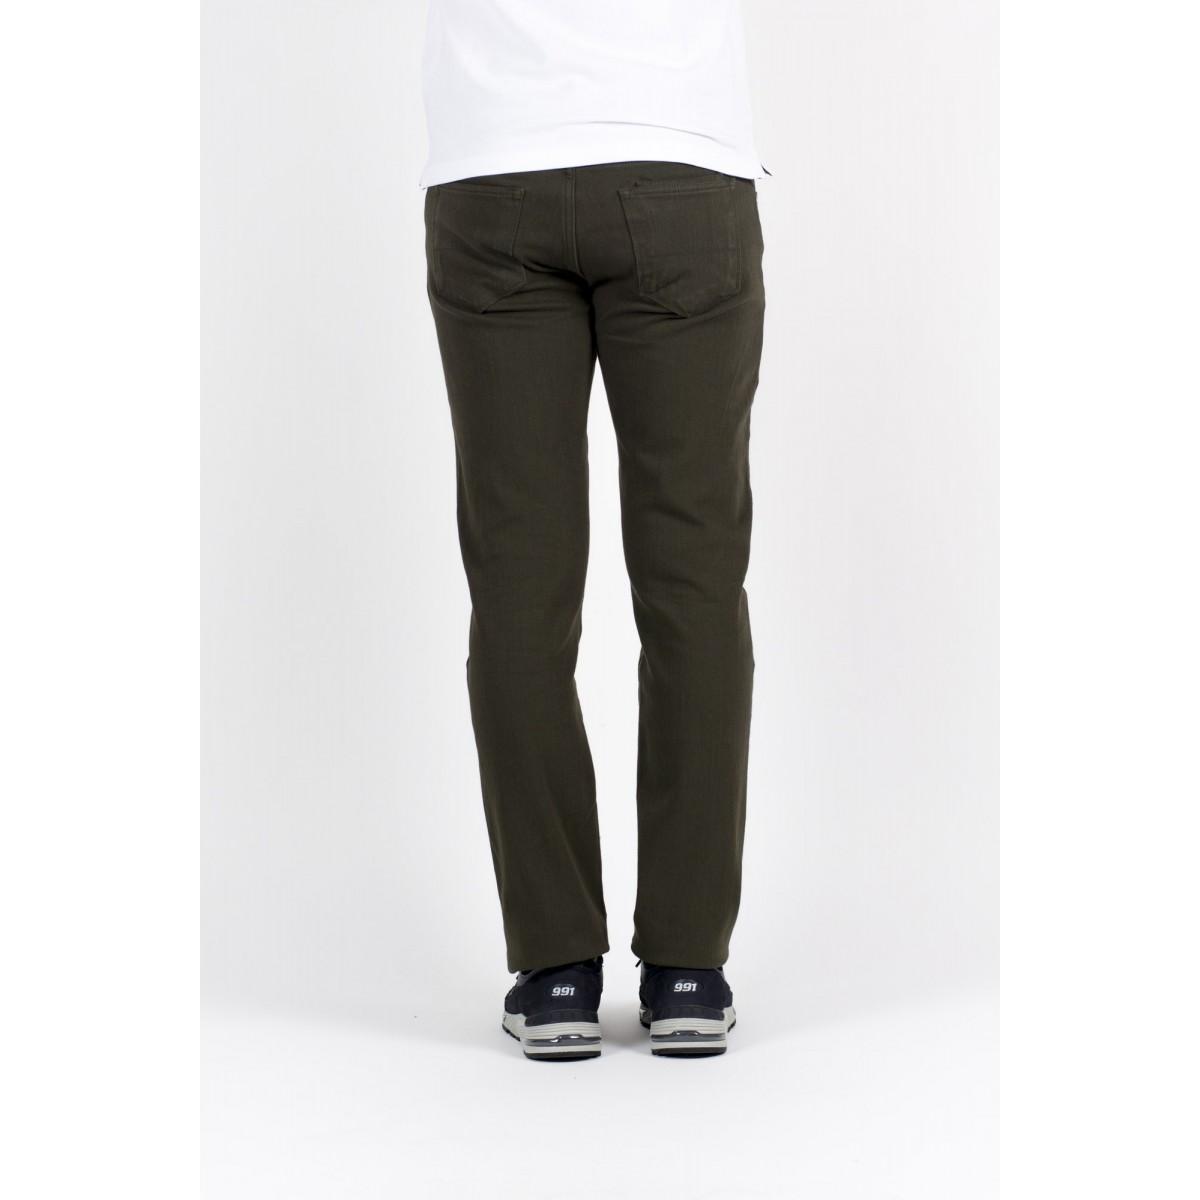 Trousers Thinple Man - Six 46 Twill Bistrech 535 - verde